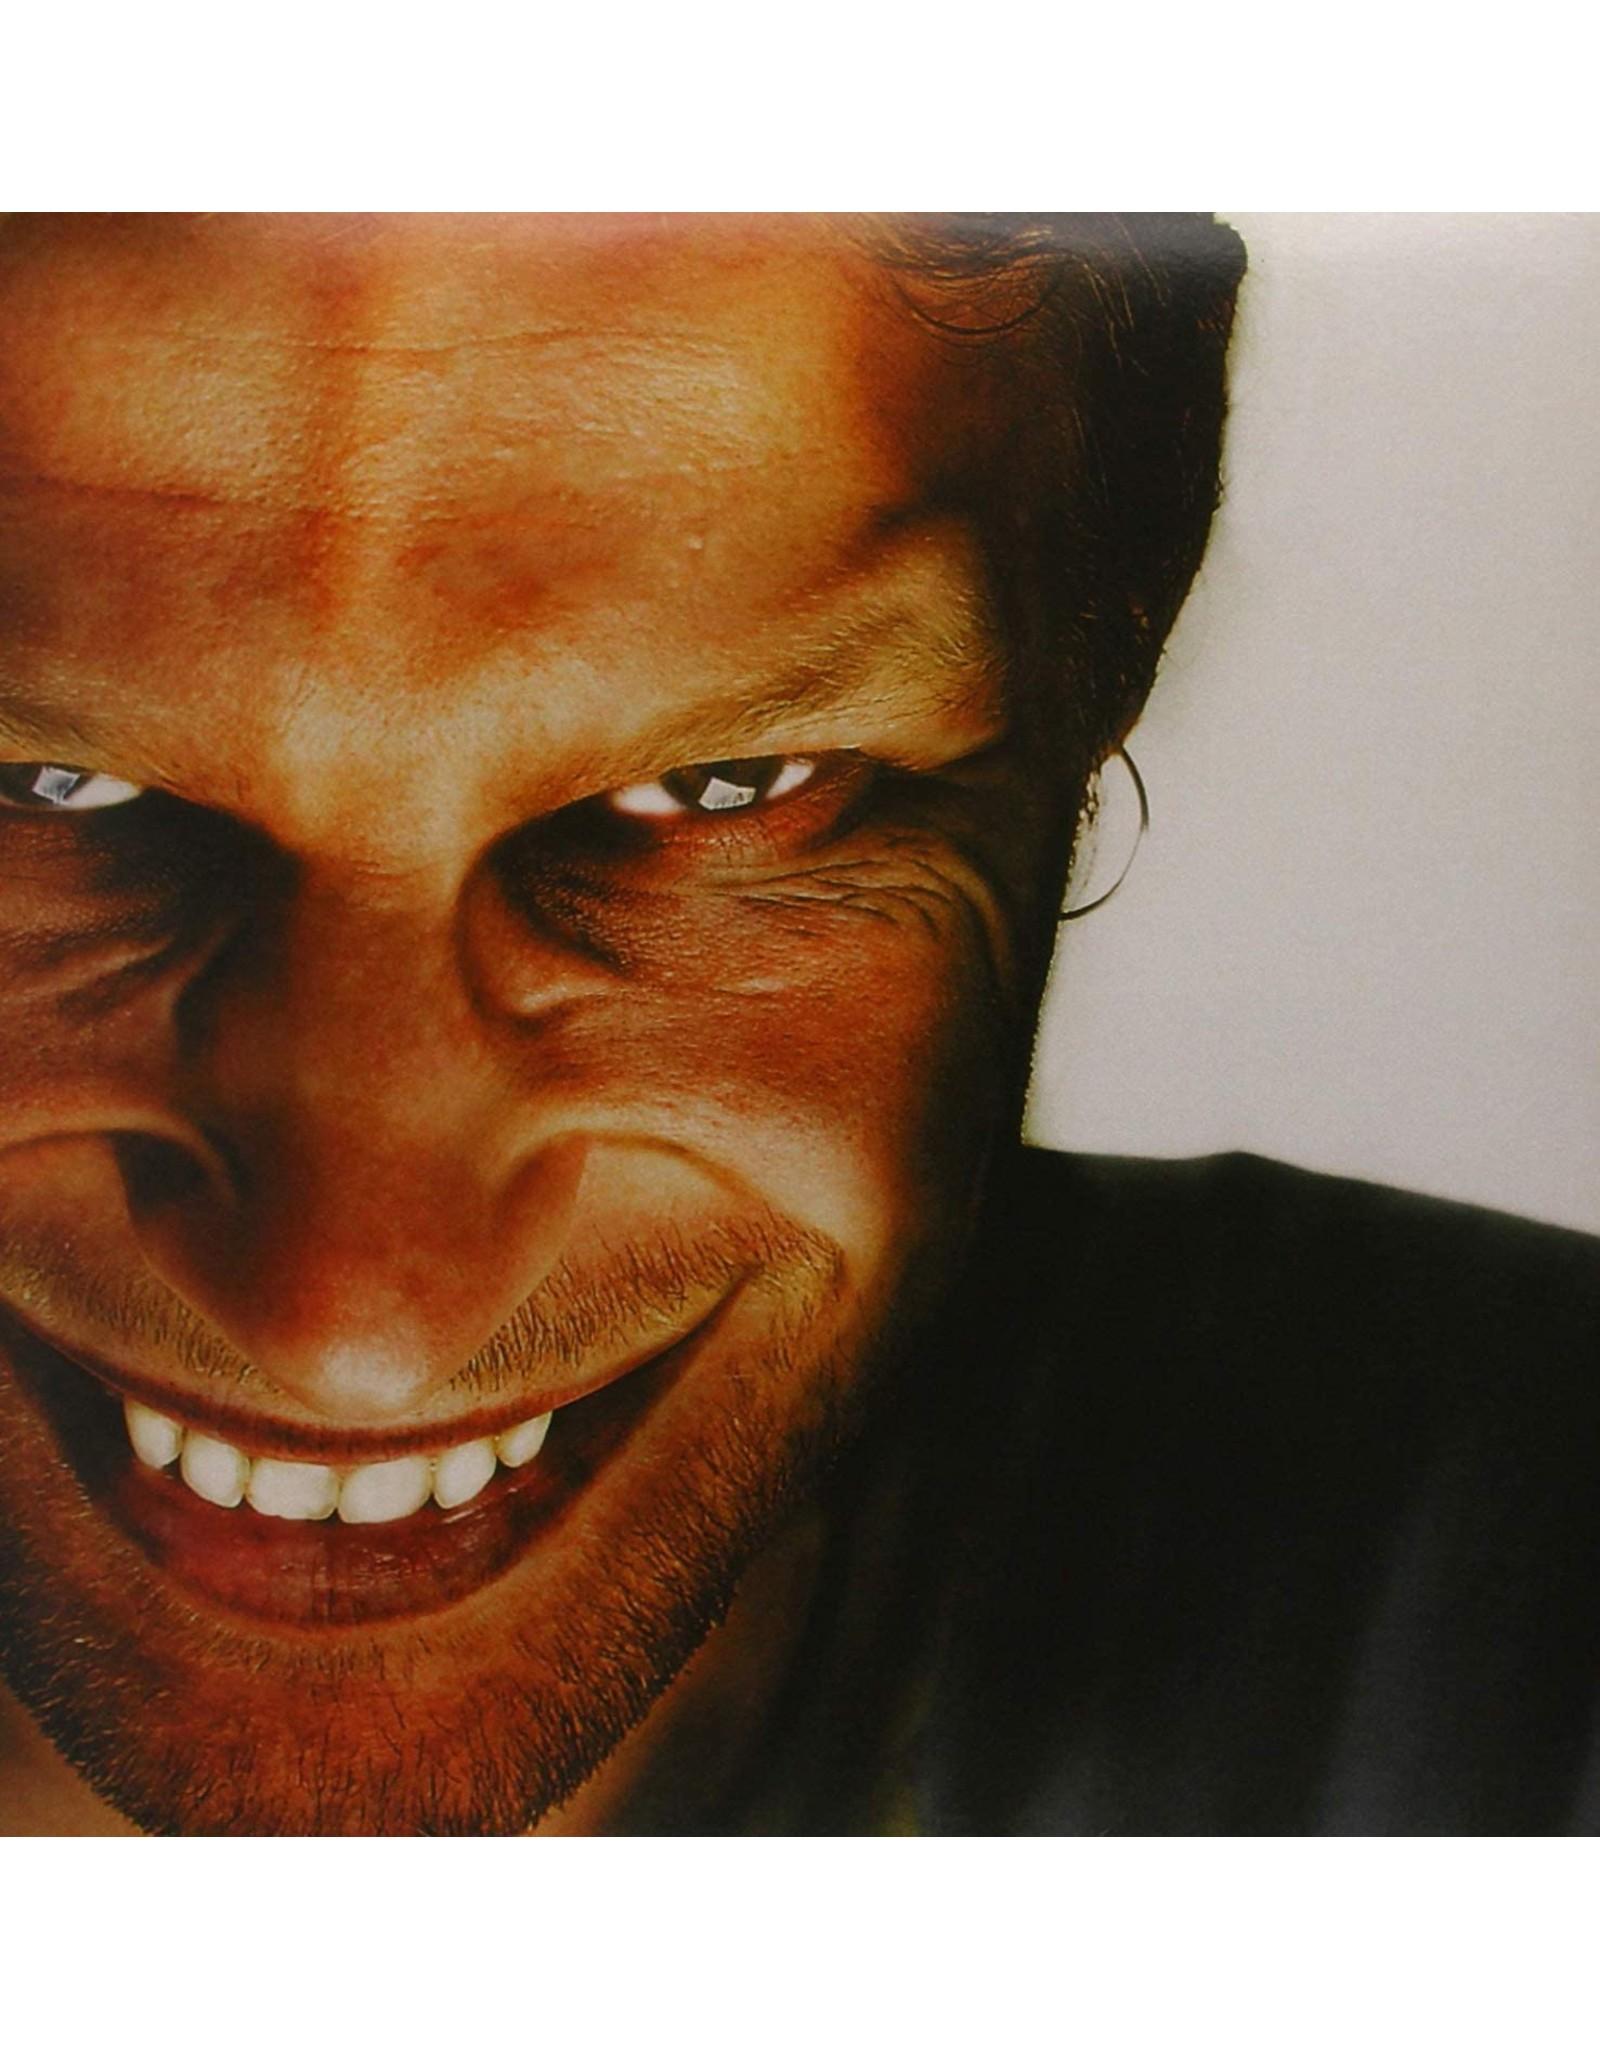 Aphex Twin - Richard D James Abum